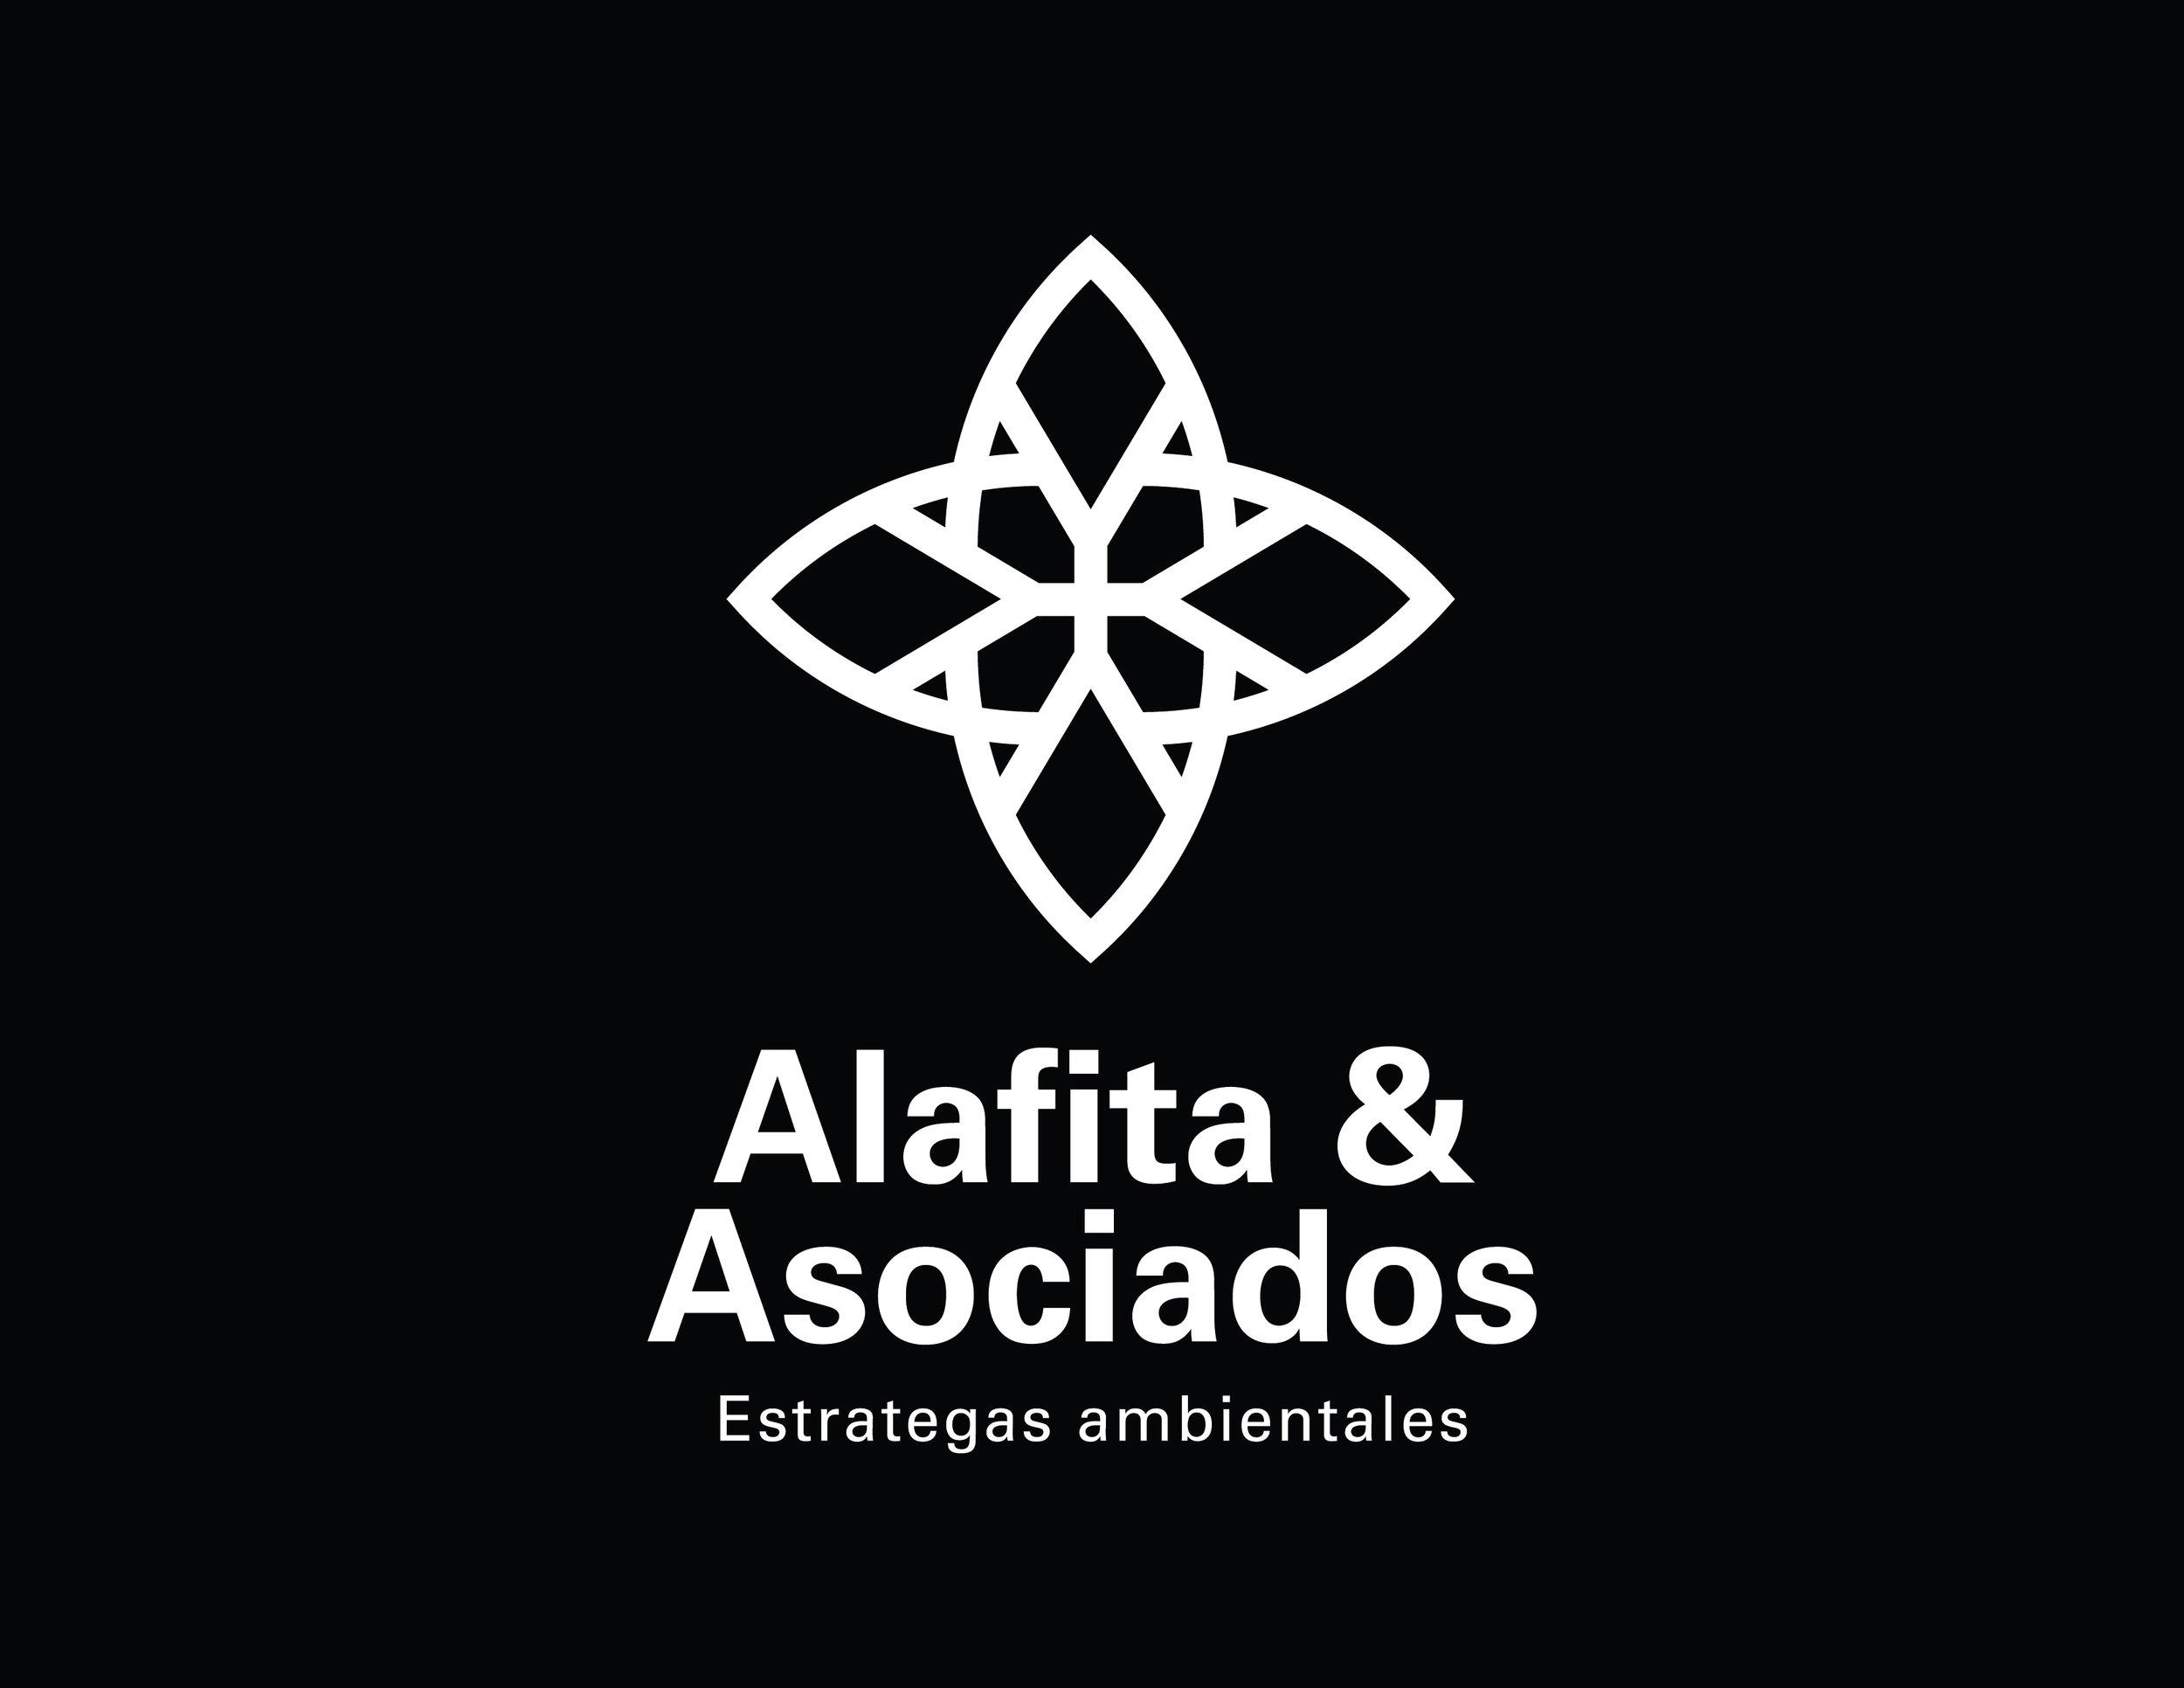 elh_alafita_03122018-03.jpg